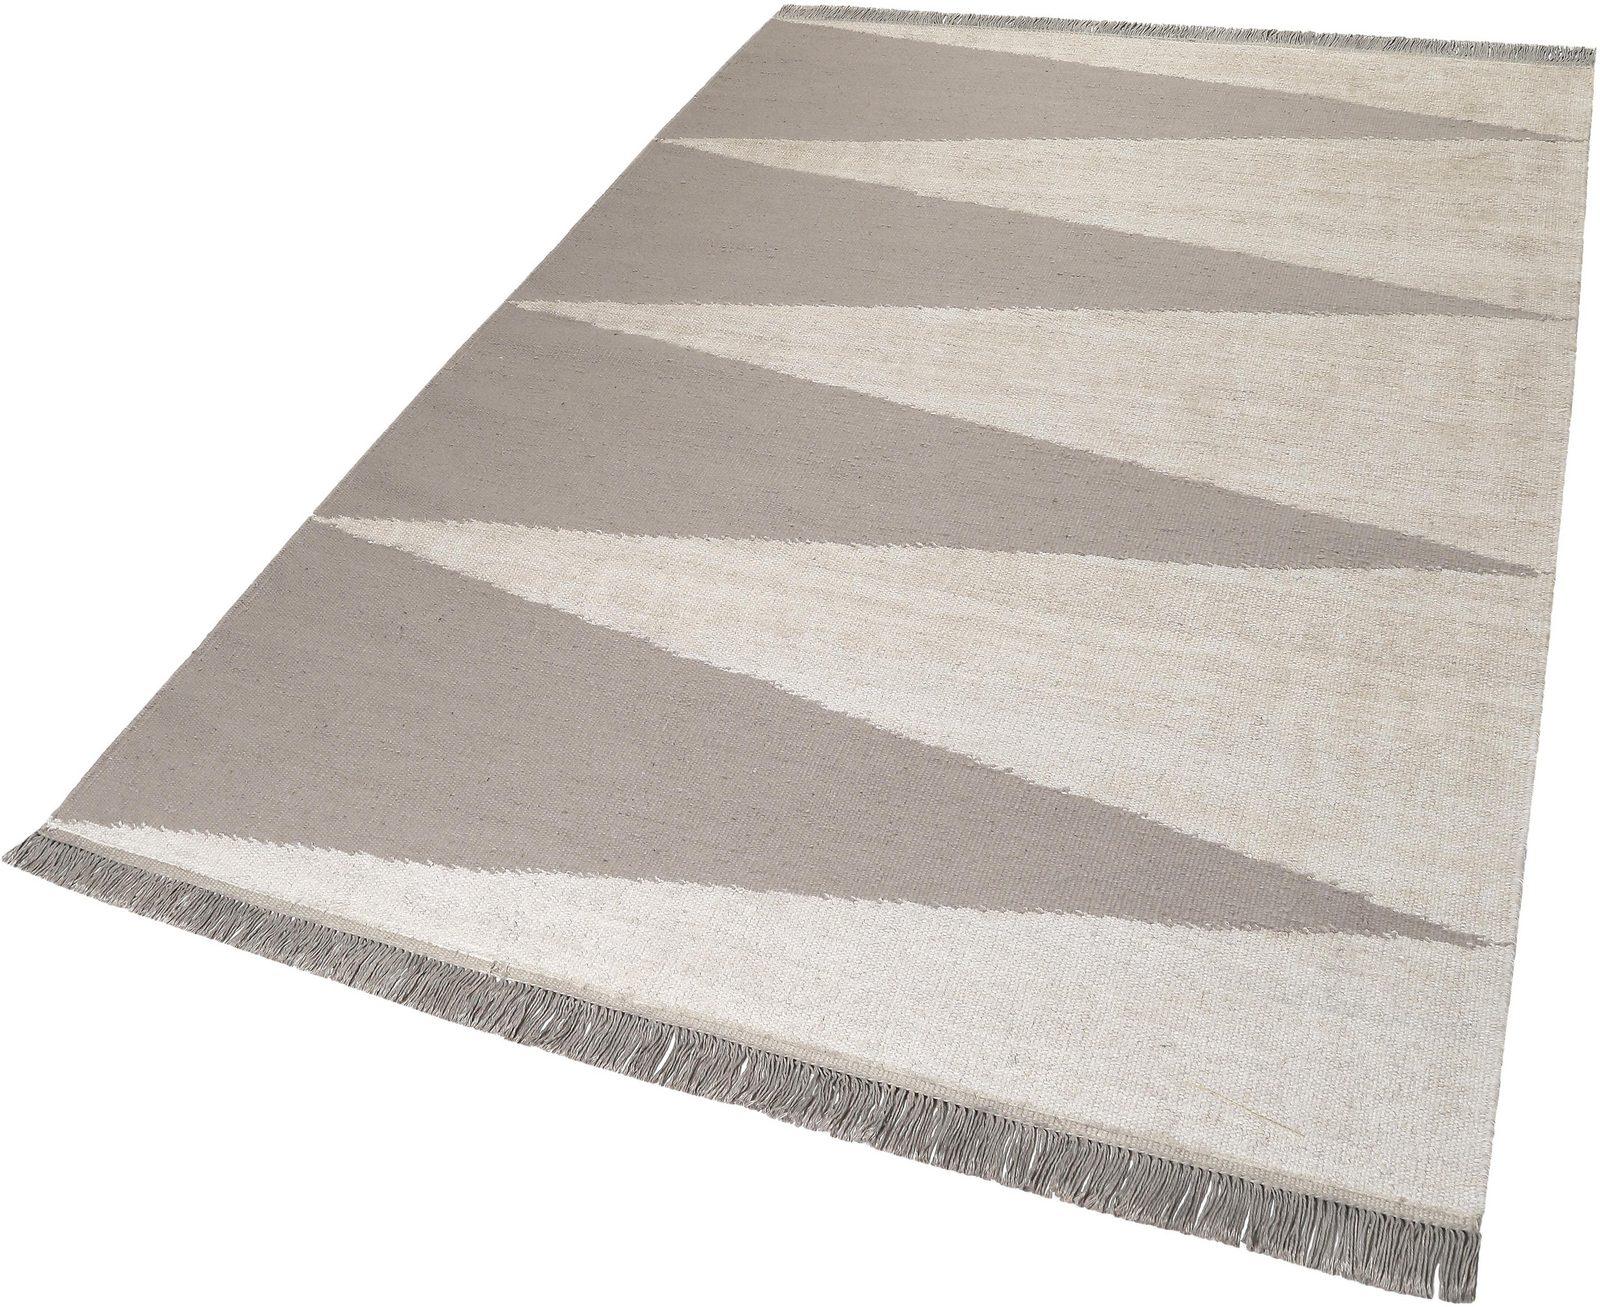 Teppich »Smart Triangle«, carpets&co, rechteckig, Höhe 5 mm - broschei